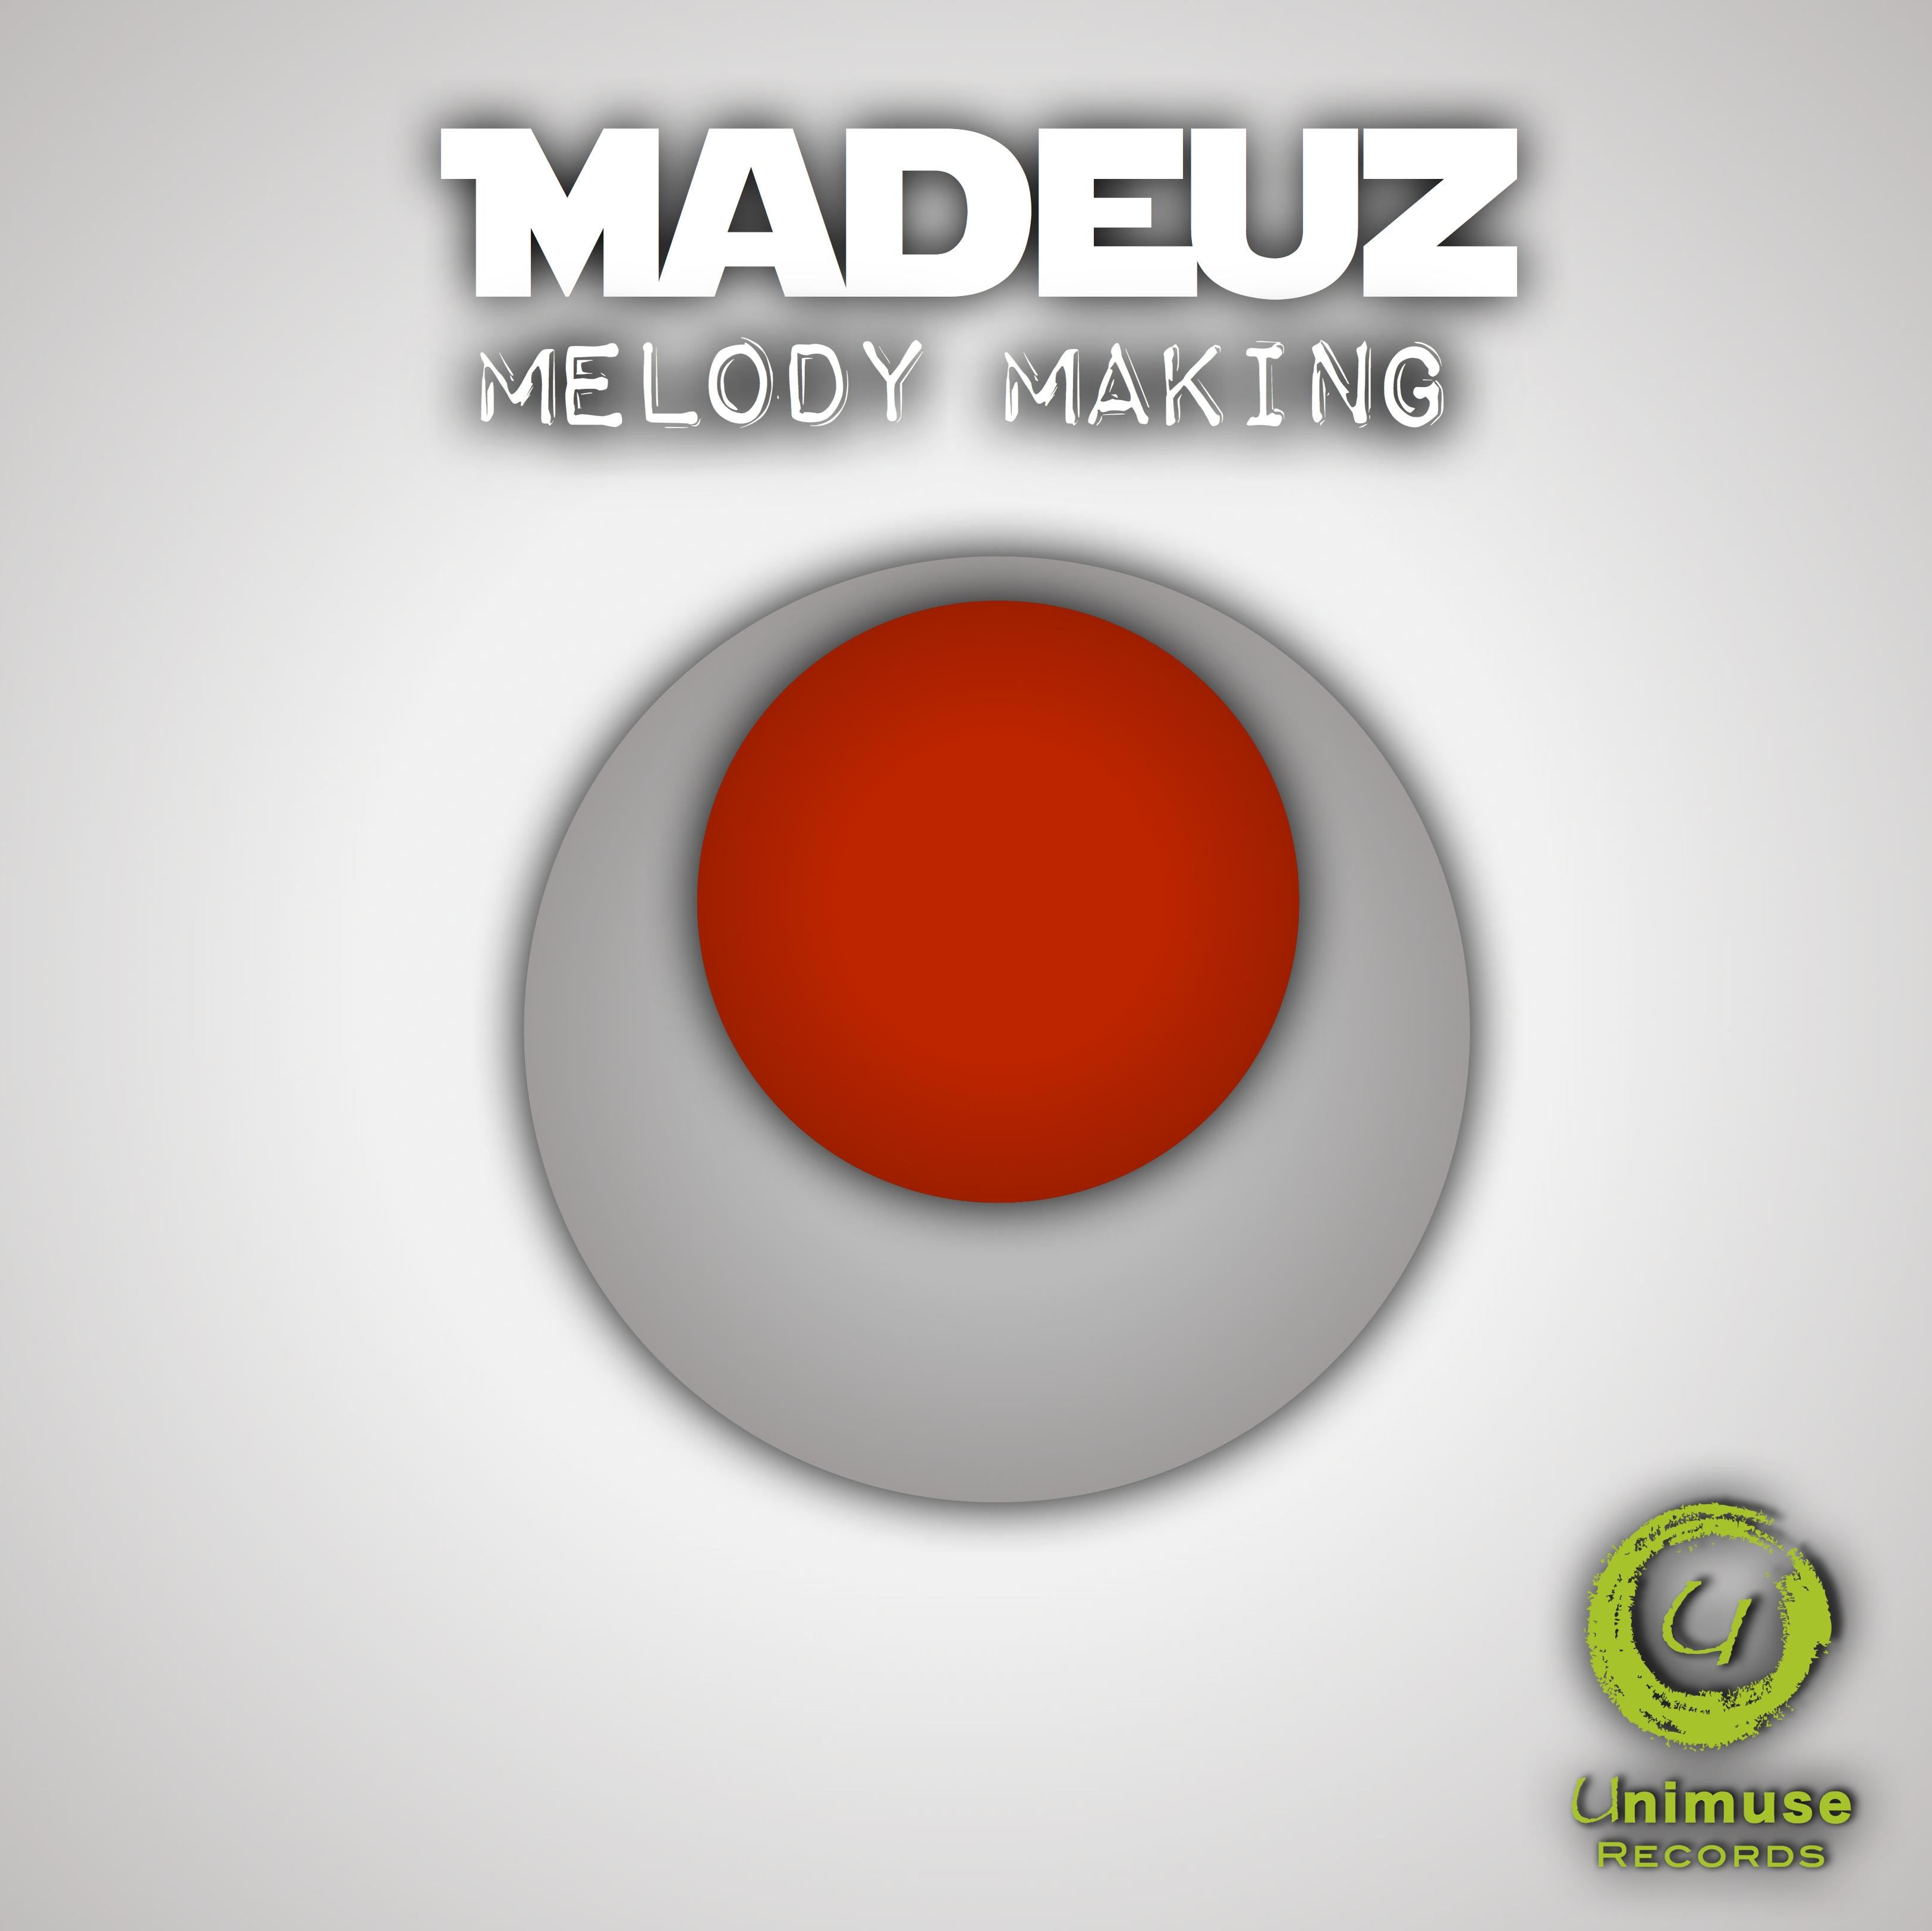 MADEUZ